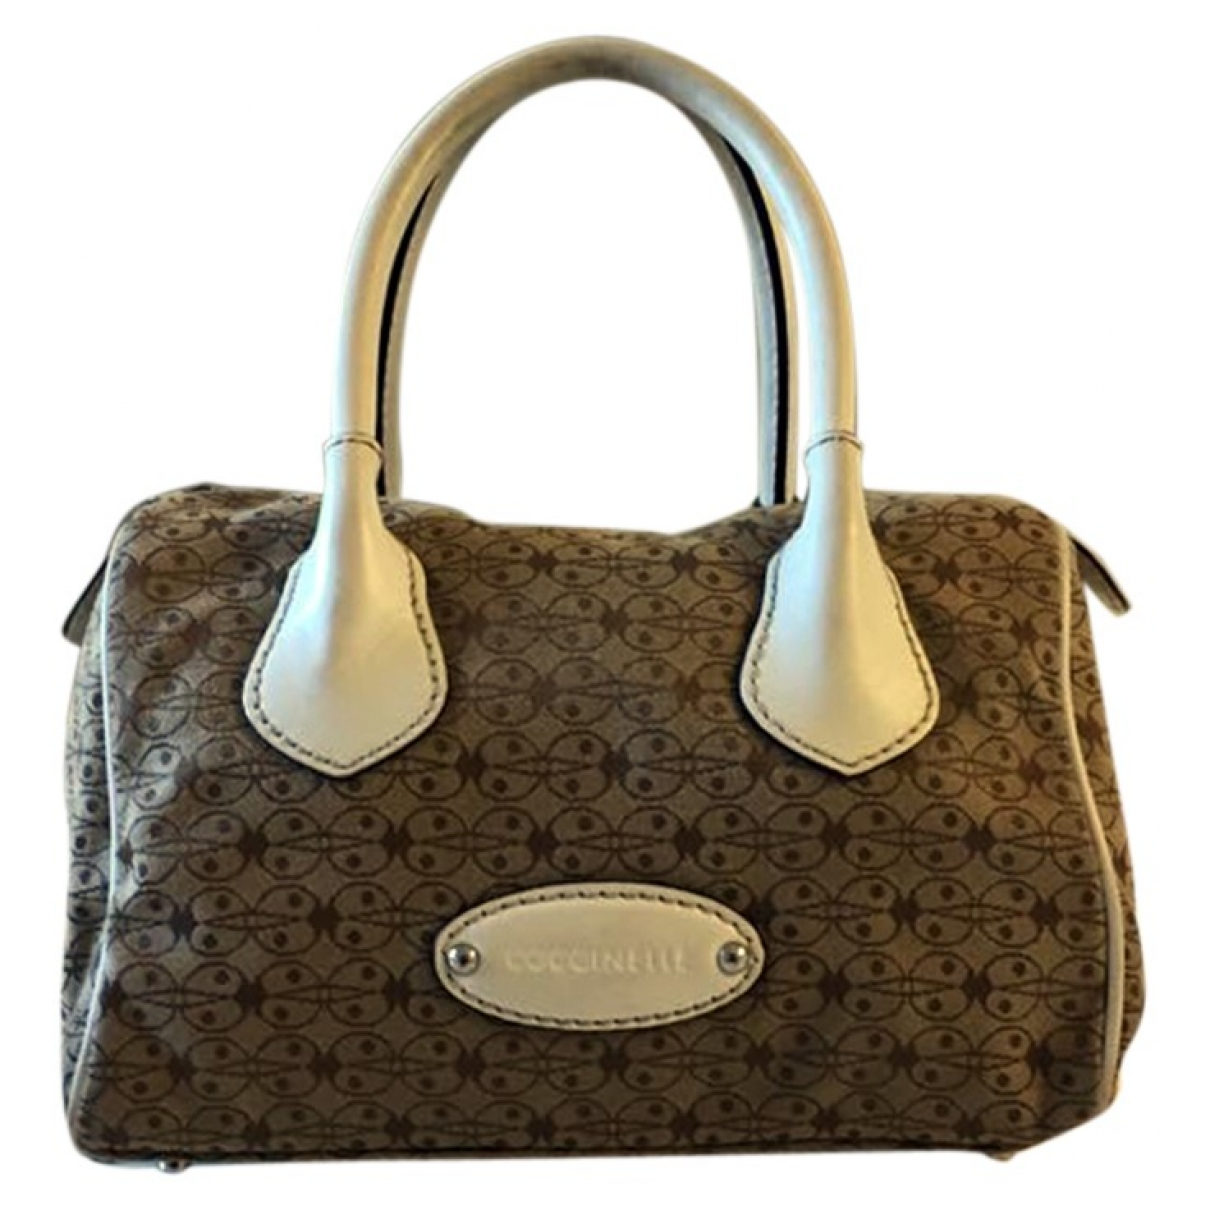 Coccinelle \N Beige Cloth handbag for Women \N